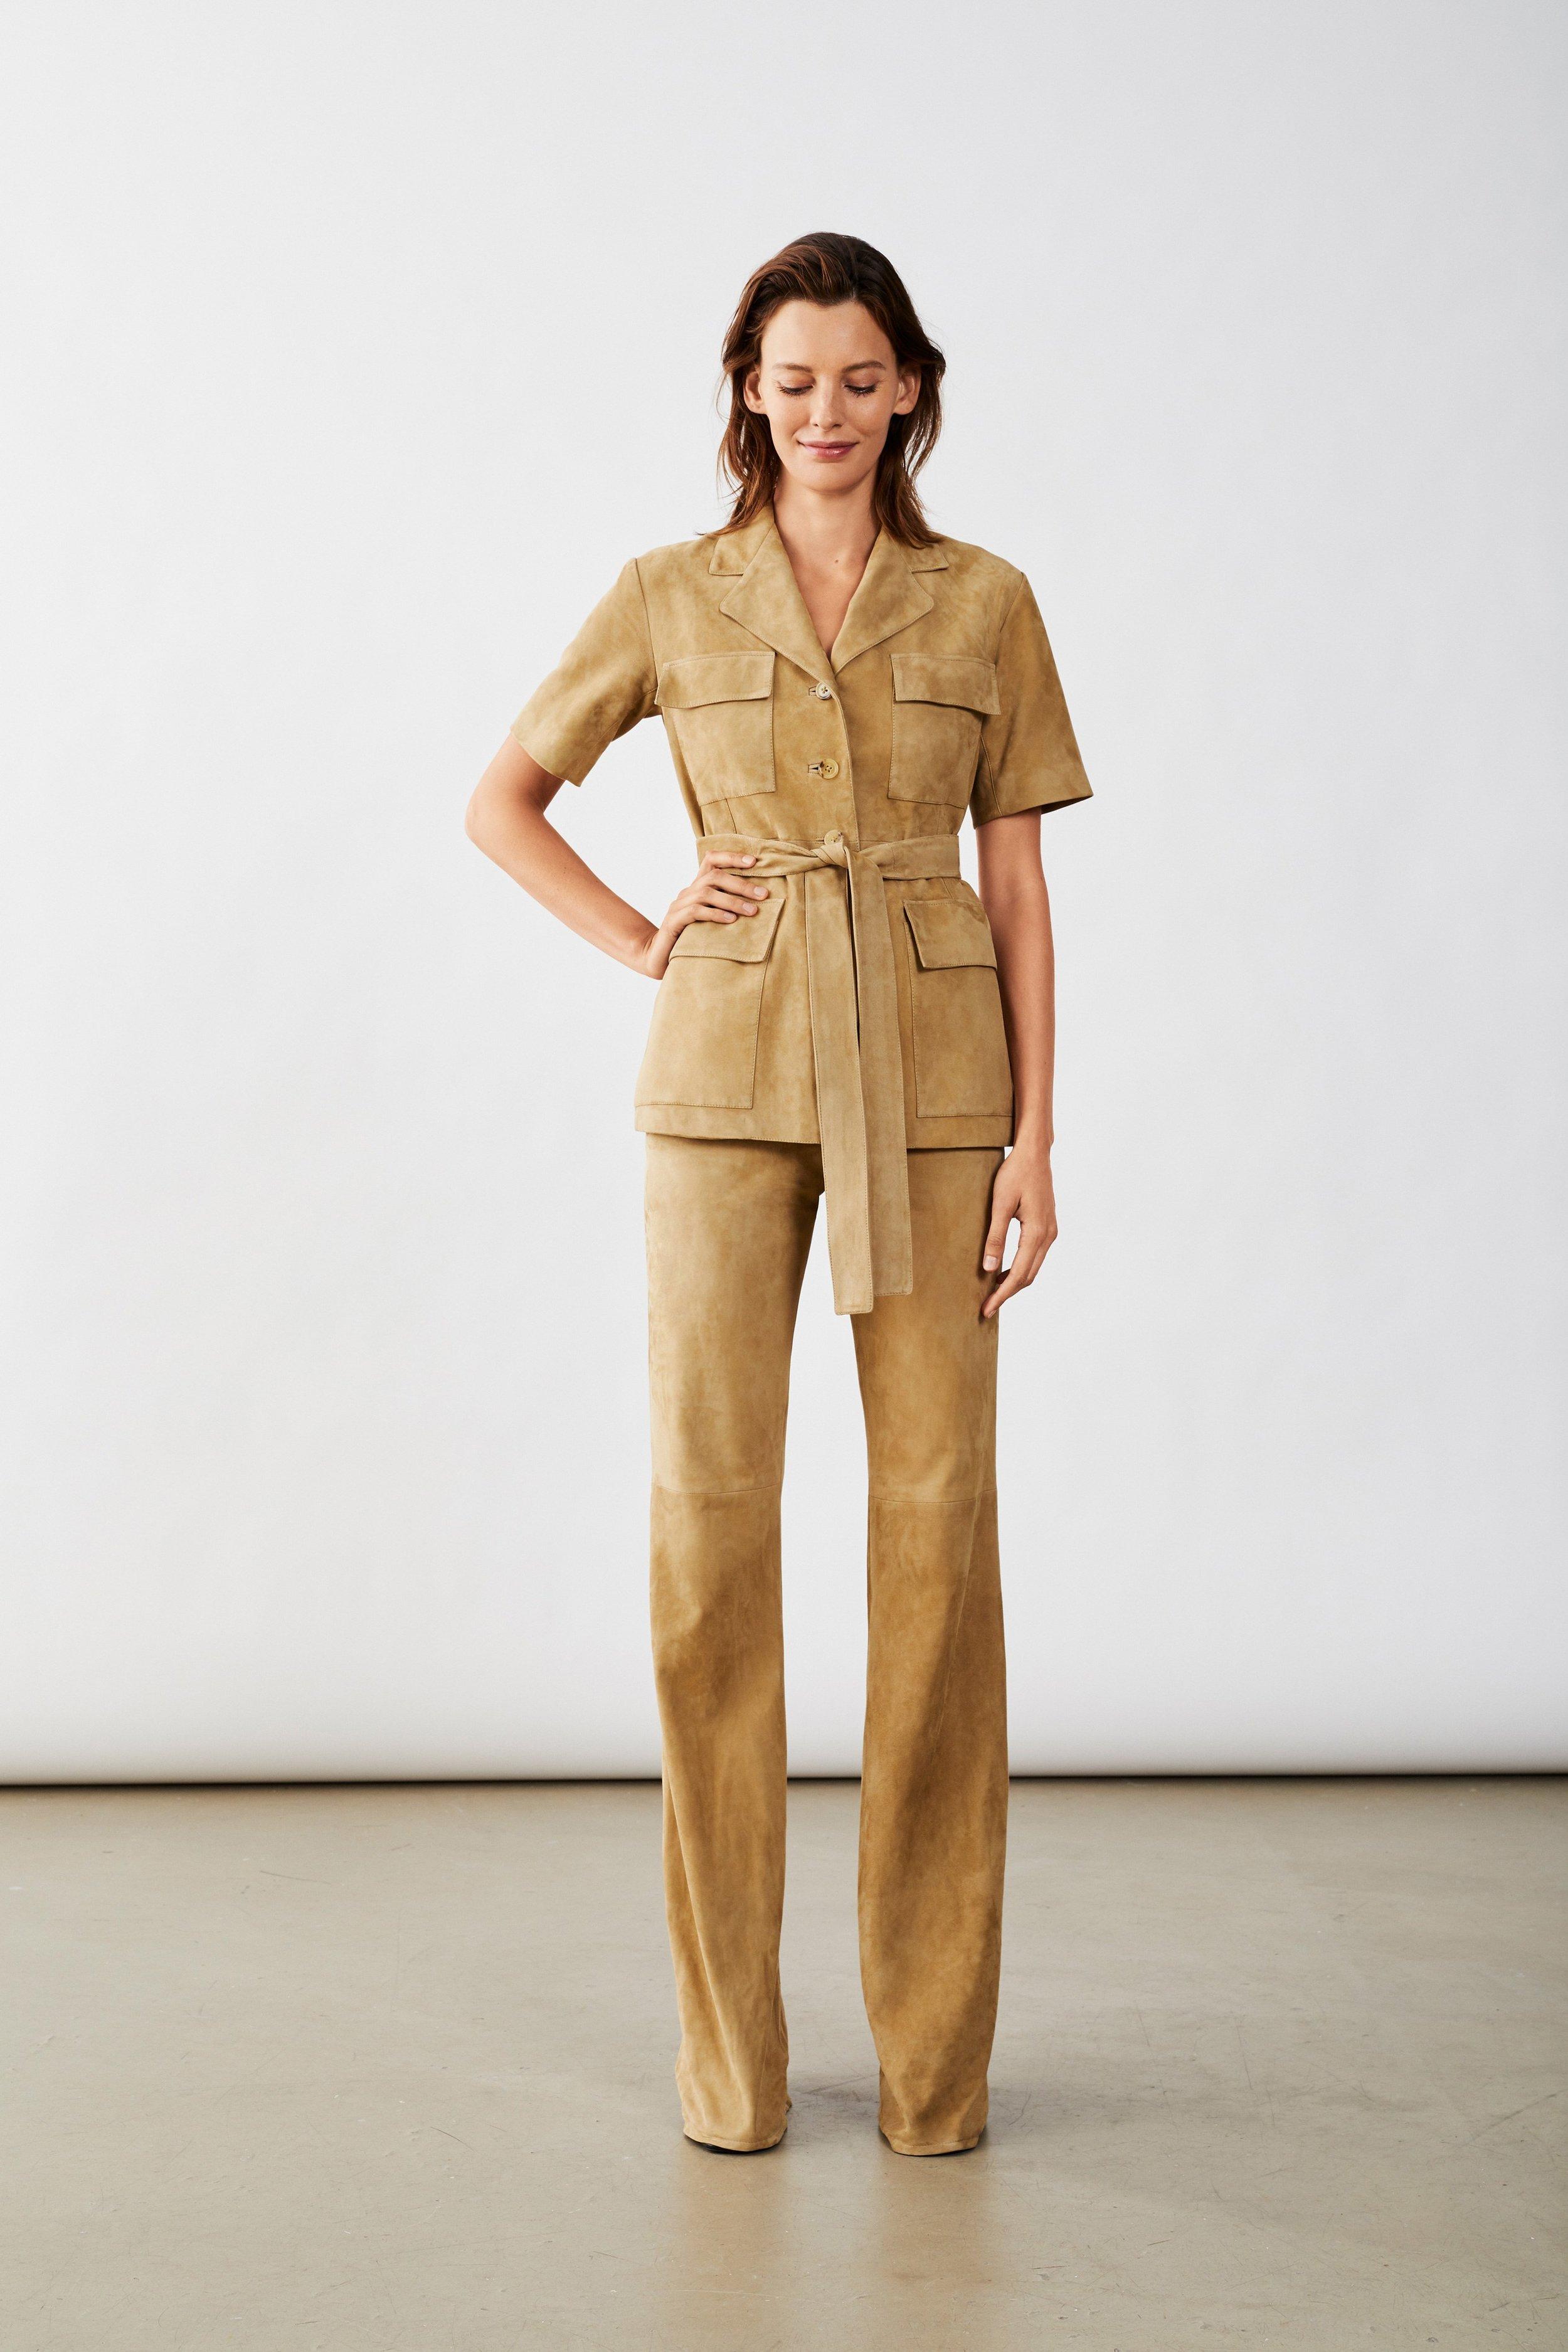 00015-nili-lotan-collection-spring-2019-ready-to-wear.jpg